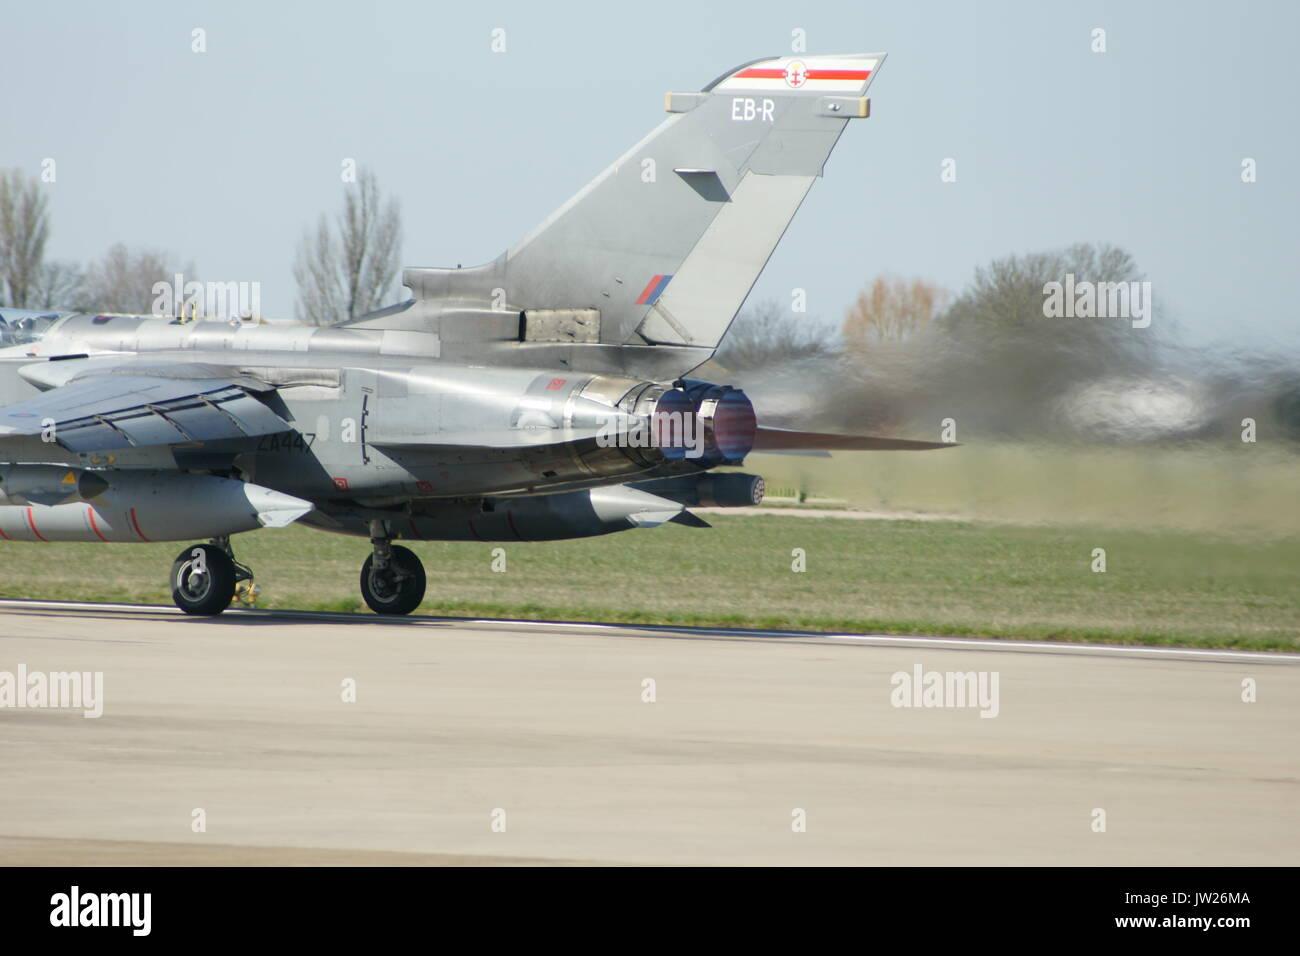 Tornado GR4 - Stock Image